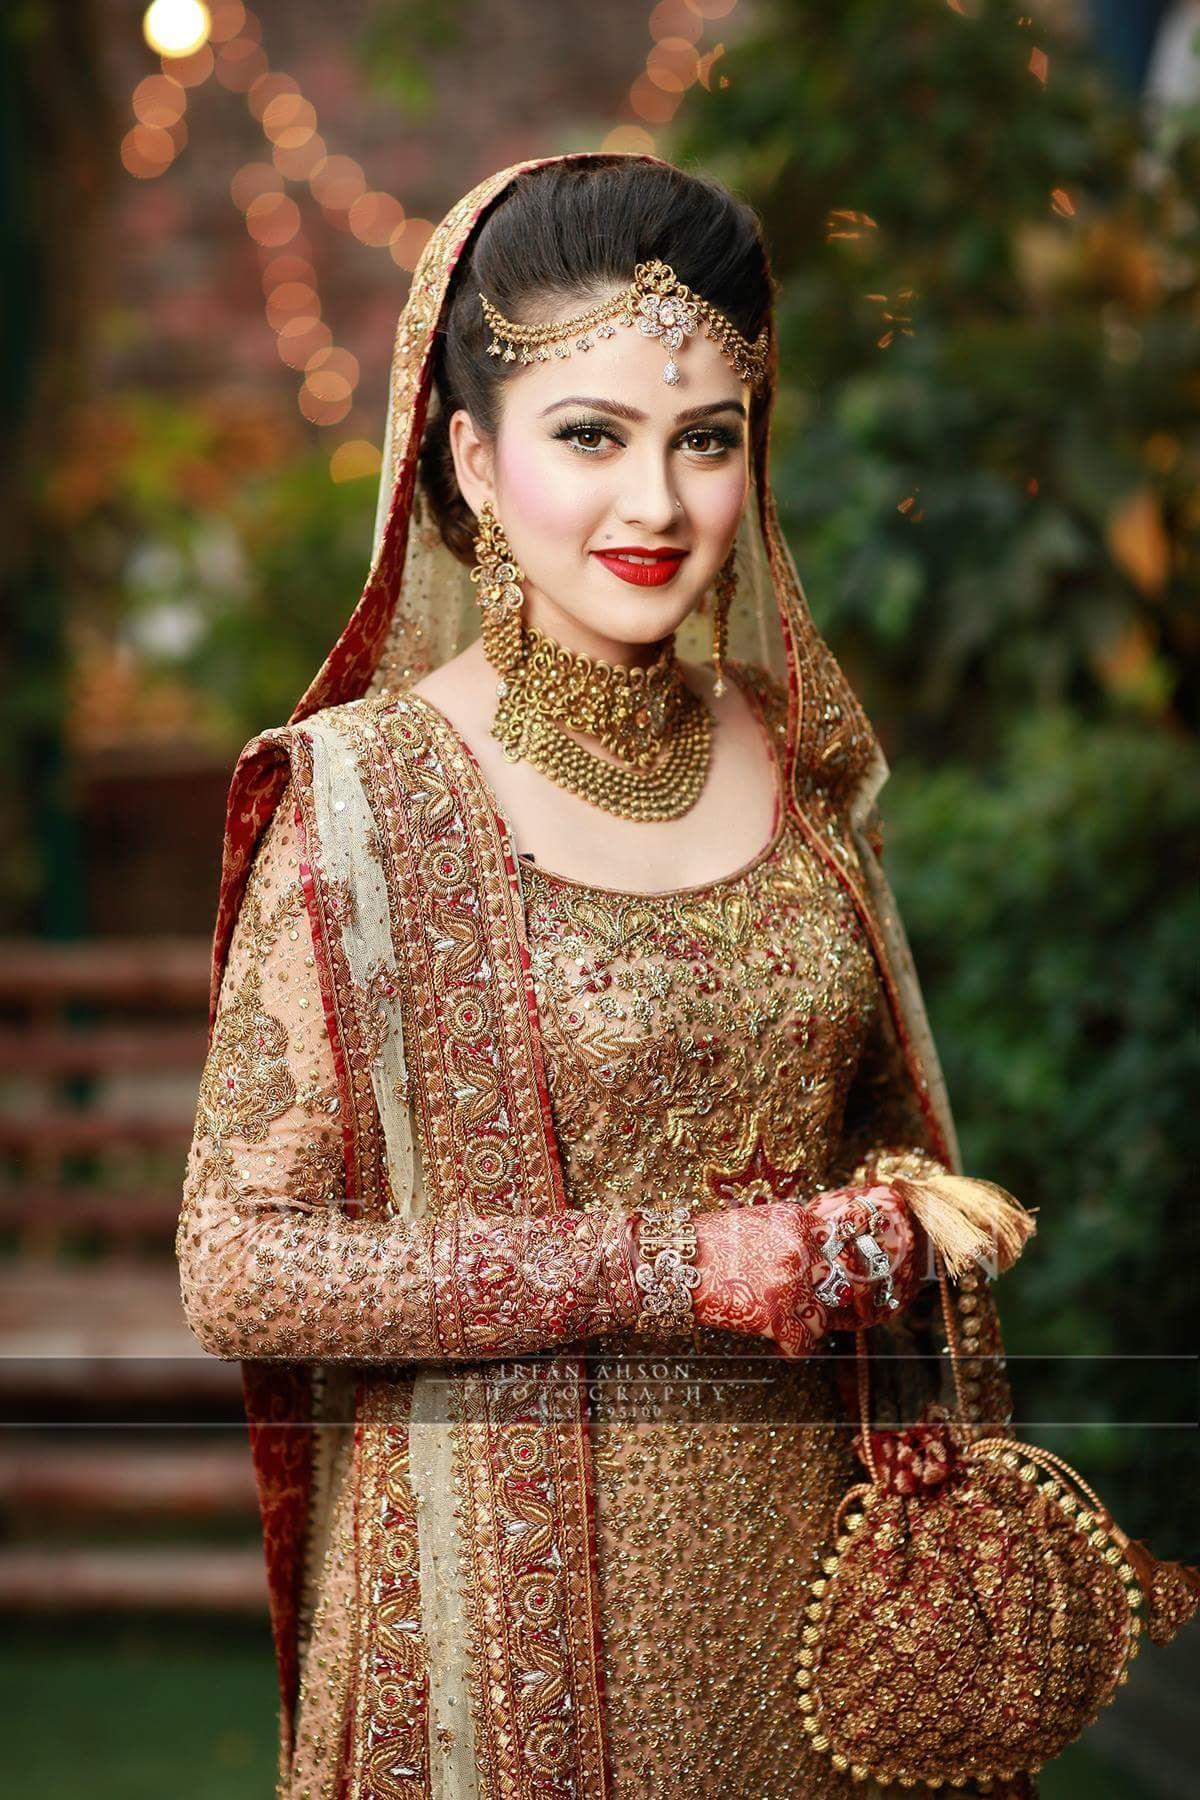 Bridal Gold Jewellery Indian Brides Pakistani bridal